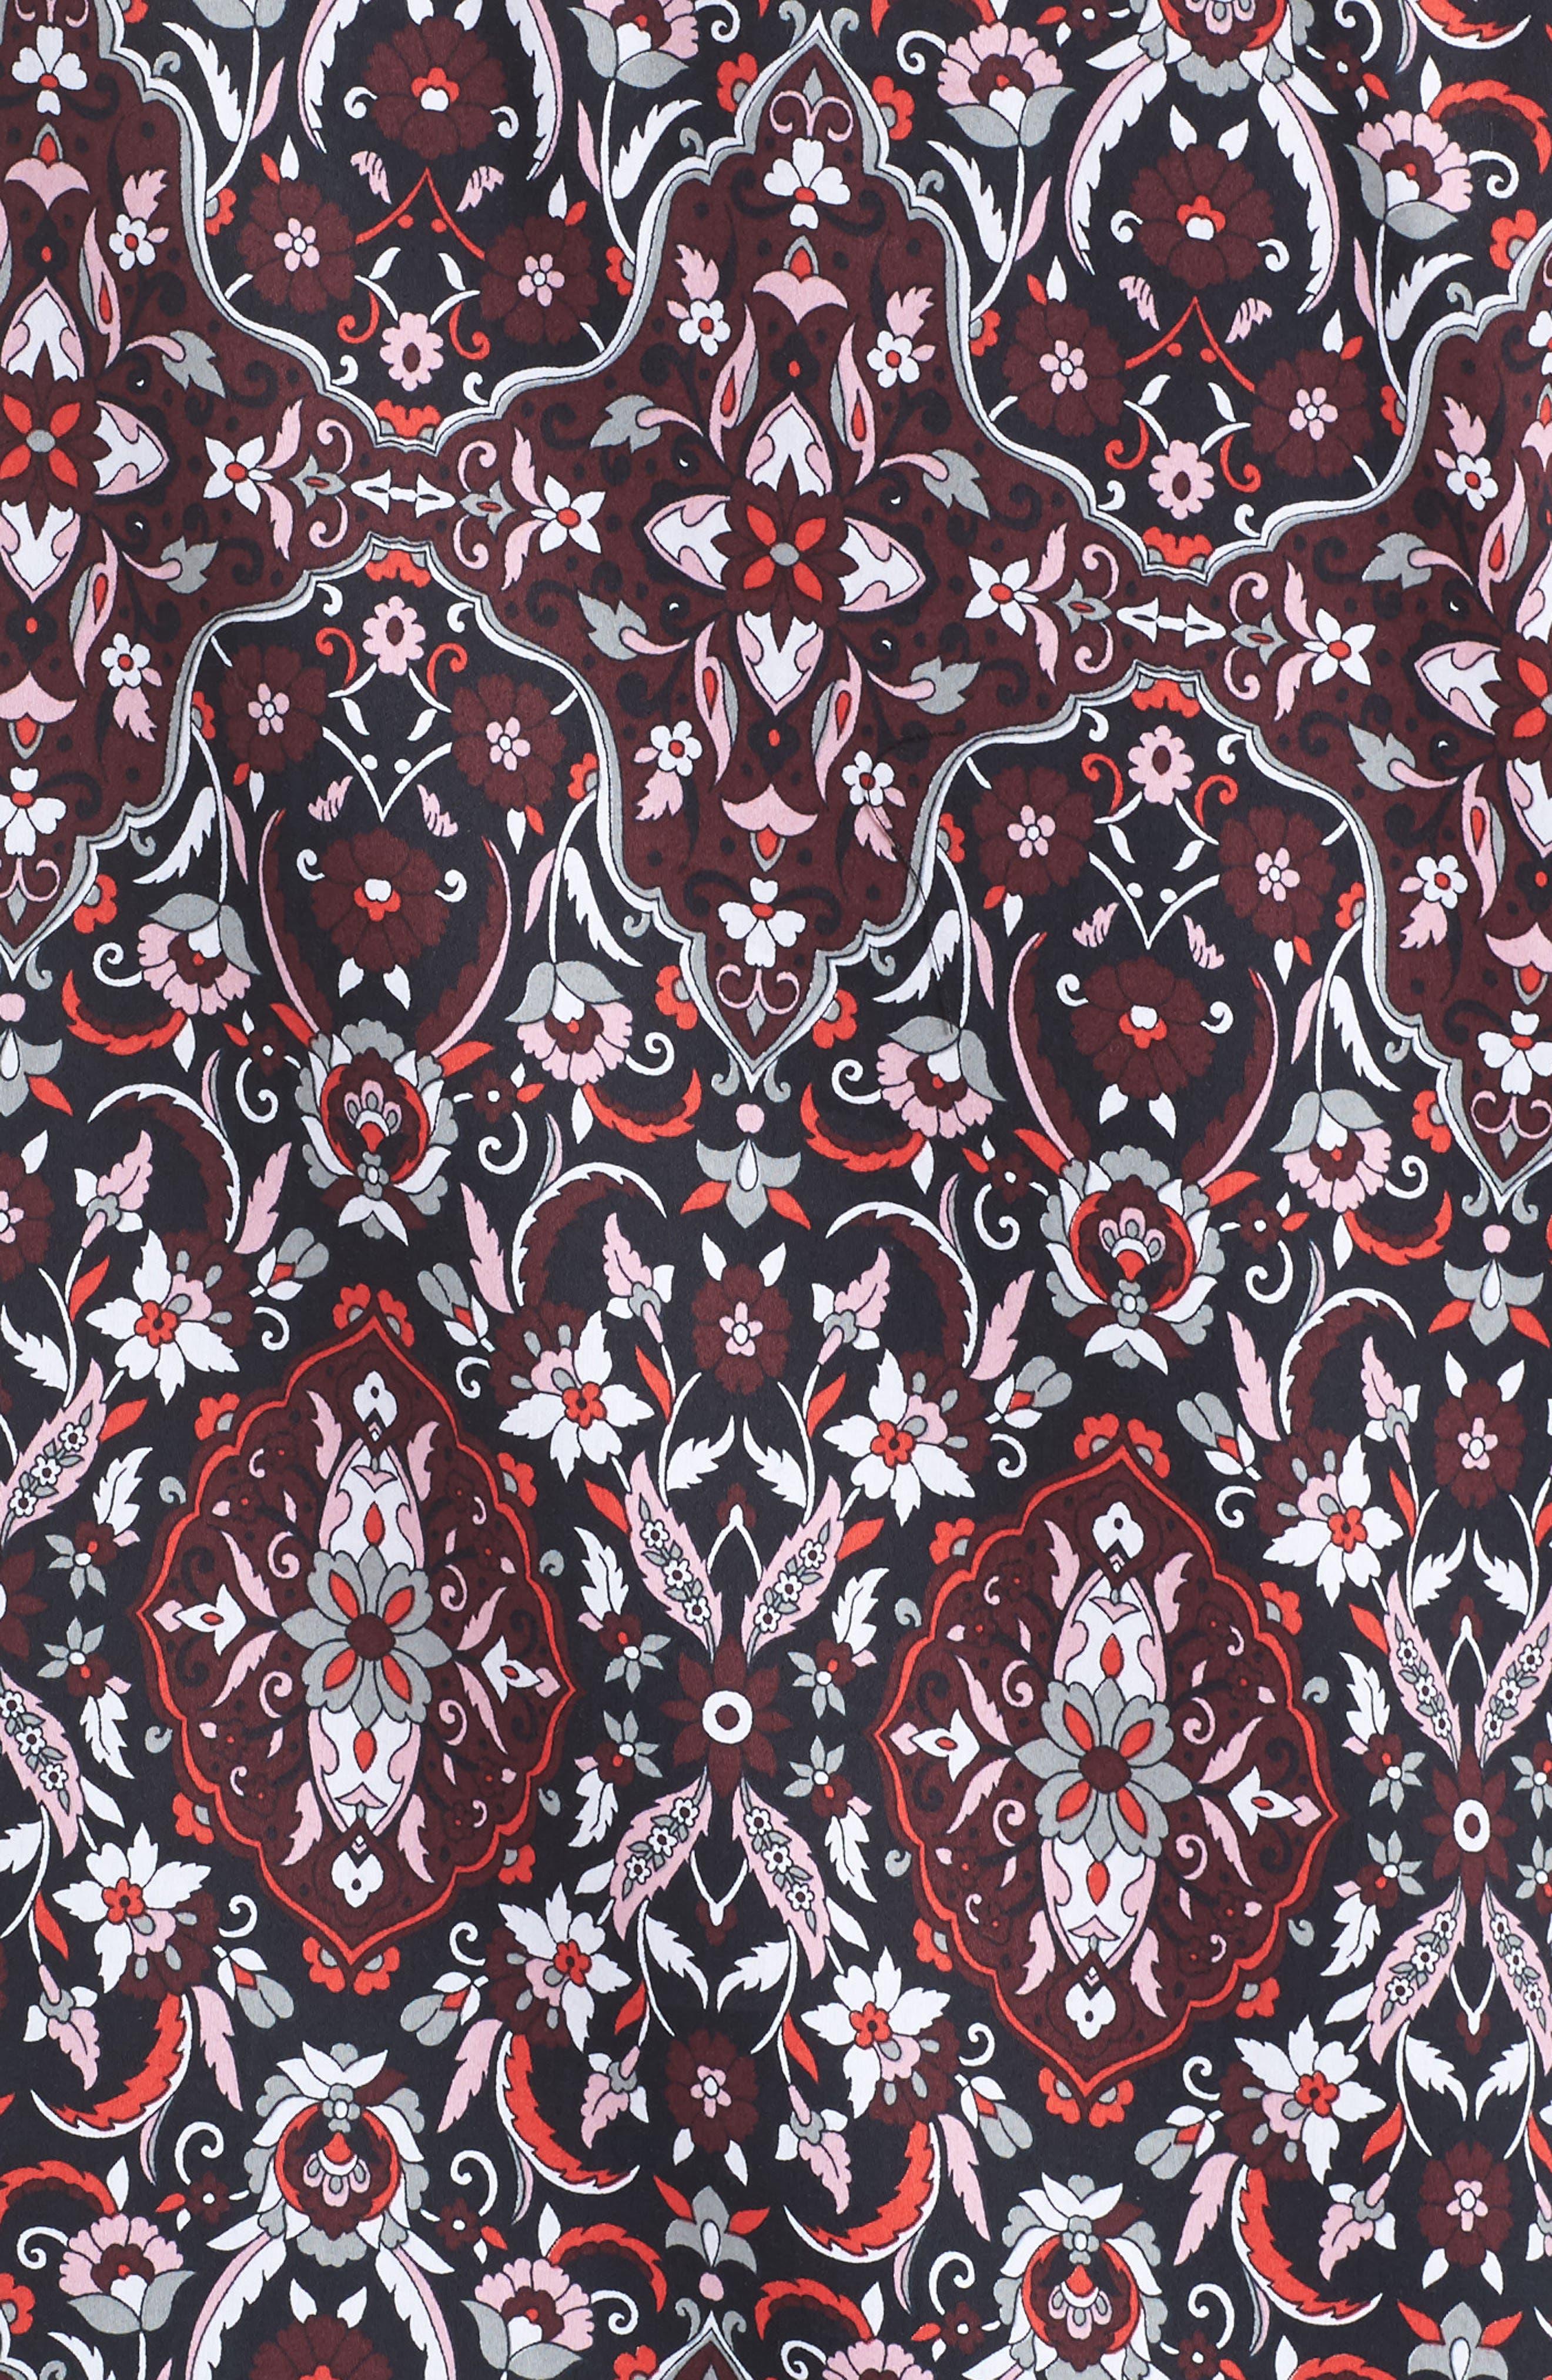 Ava Heirloom Paisley Print Cotton Shirt,                             Alternate thumbnail 5, color,                             602